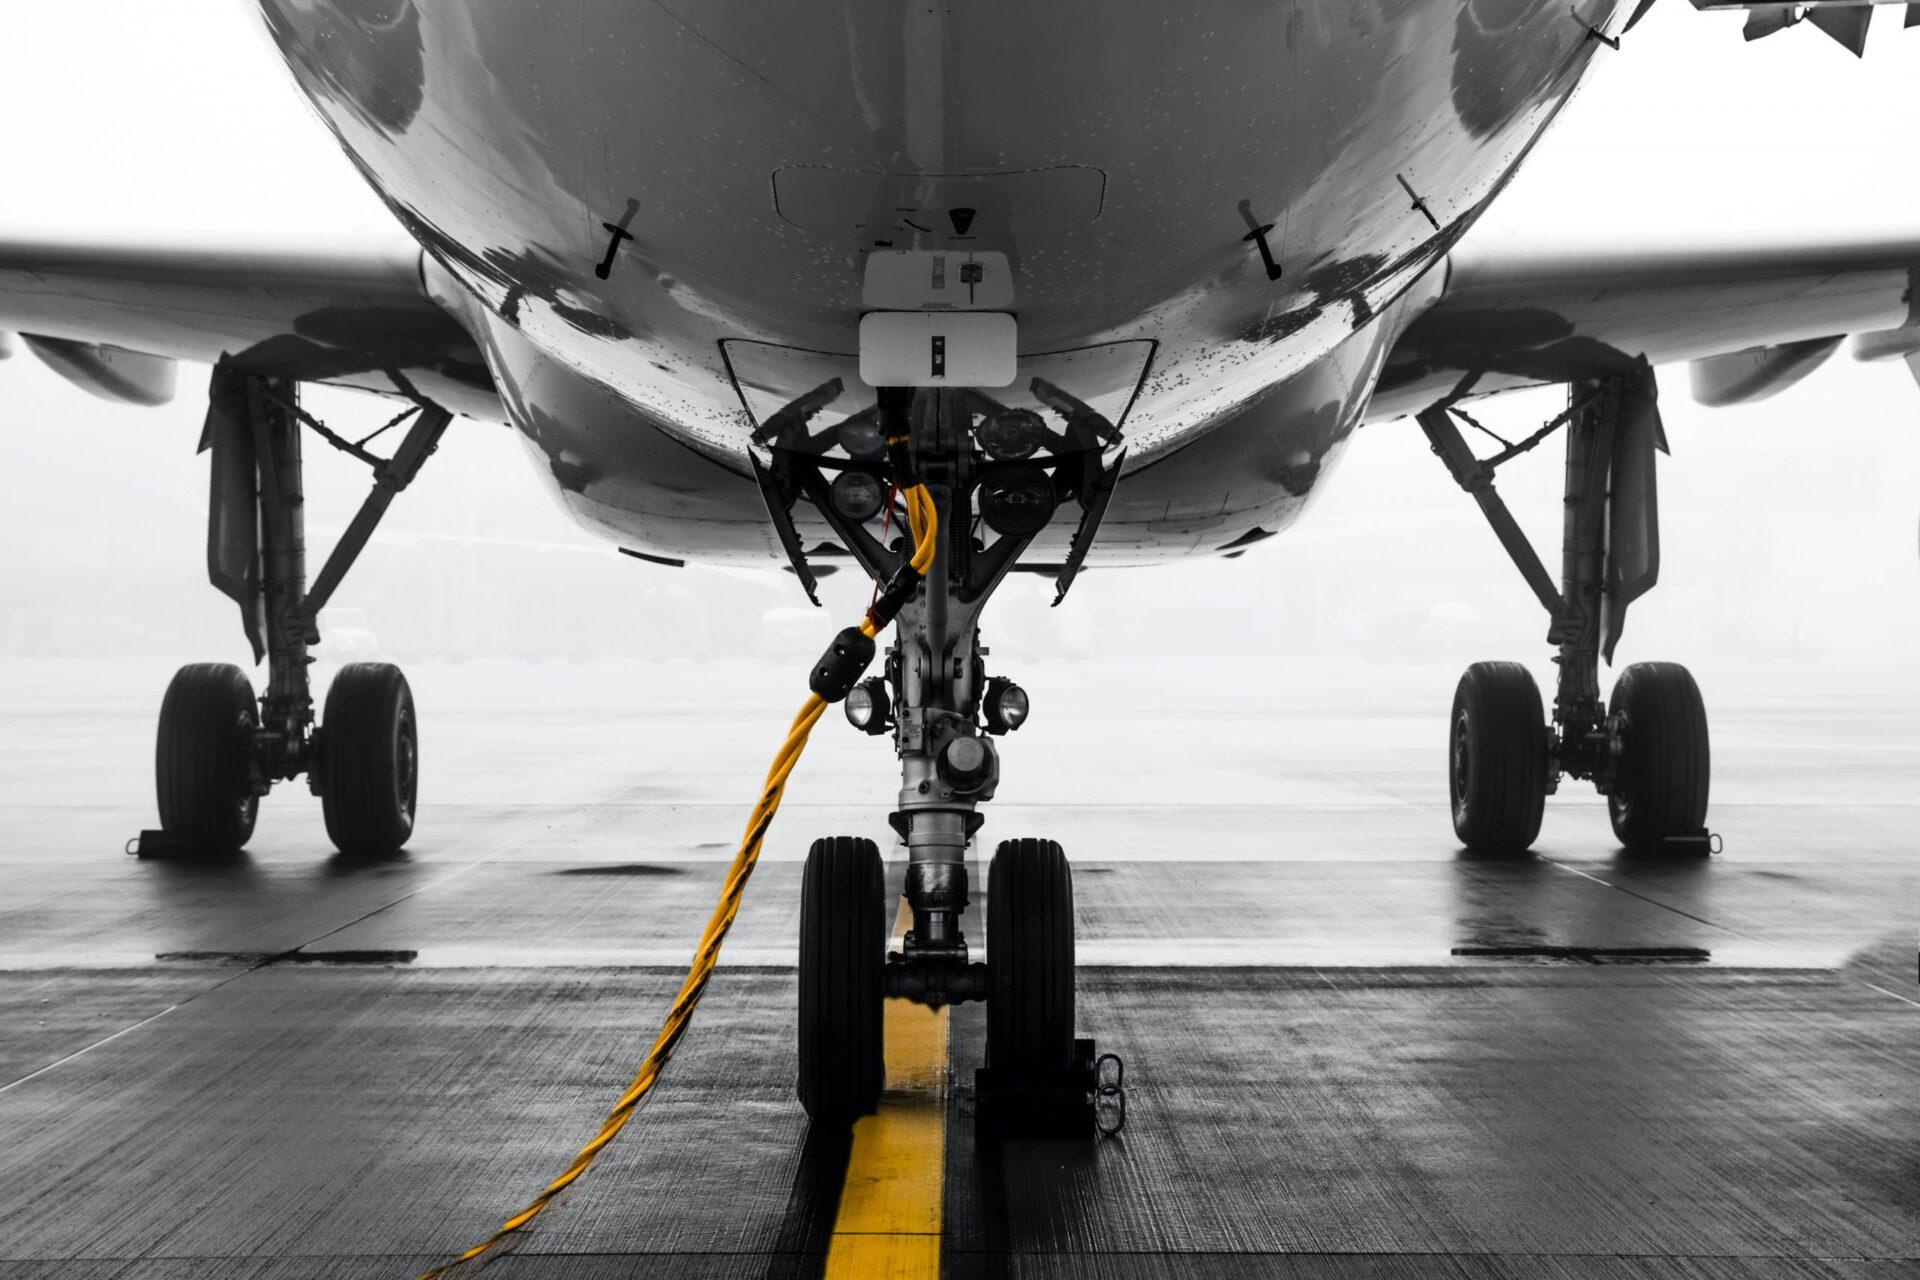 aircraft parking procedure